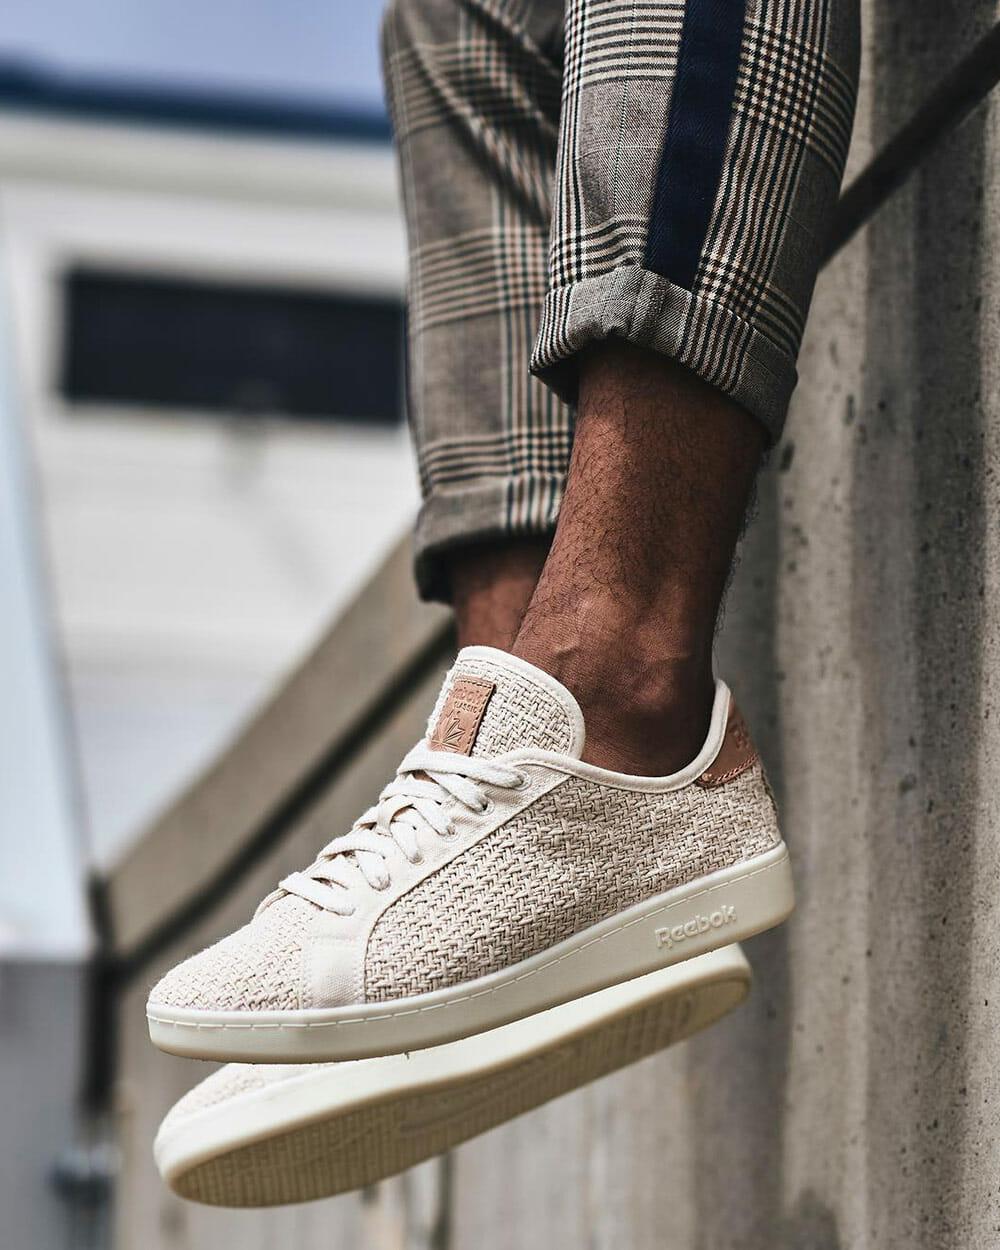 Rebook Cotton + Corn sustainable sneakers